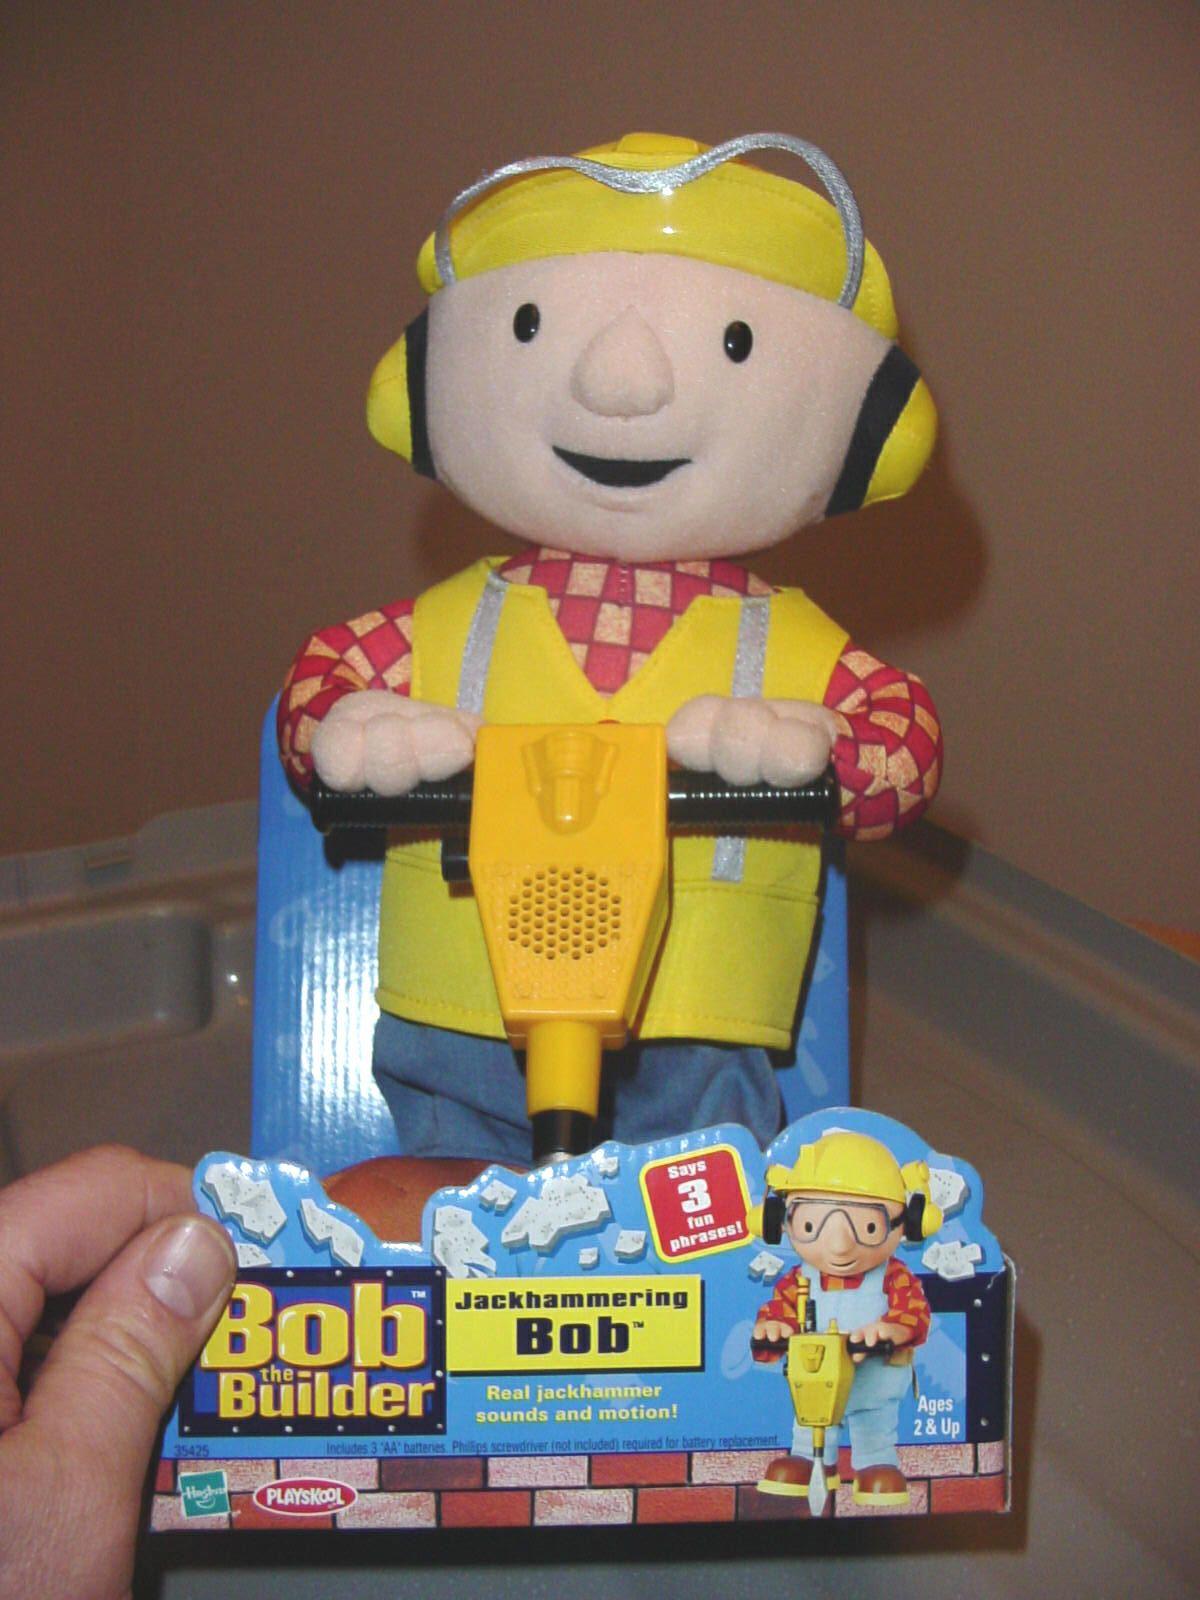 Playskool Bob The Builder Talking Jackhammering Bob Talks New In